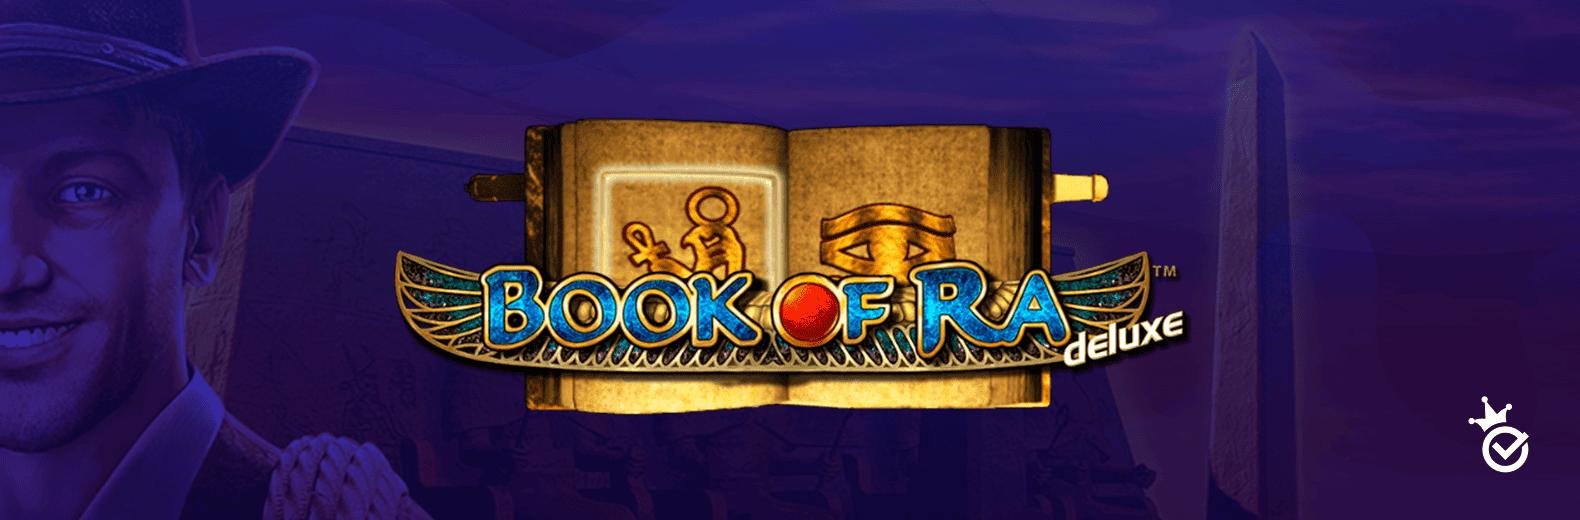 Book of Ra Deluxe 6 spēļu automāts